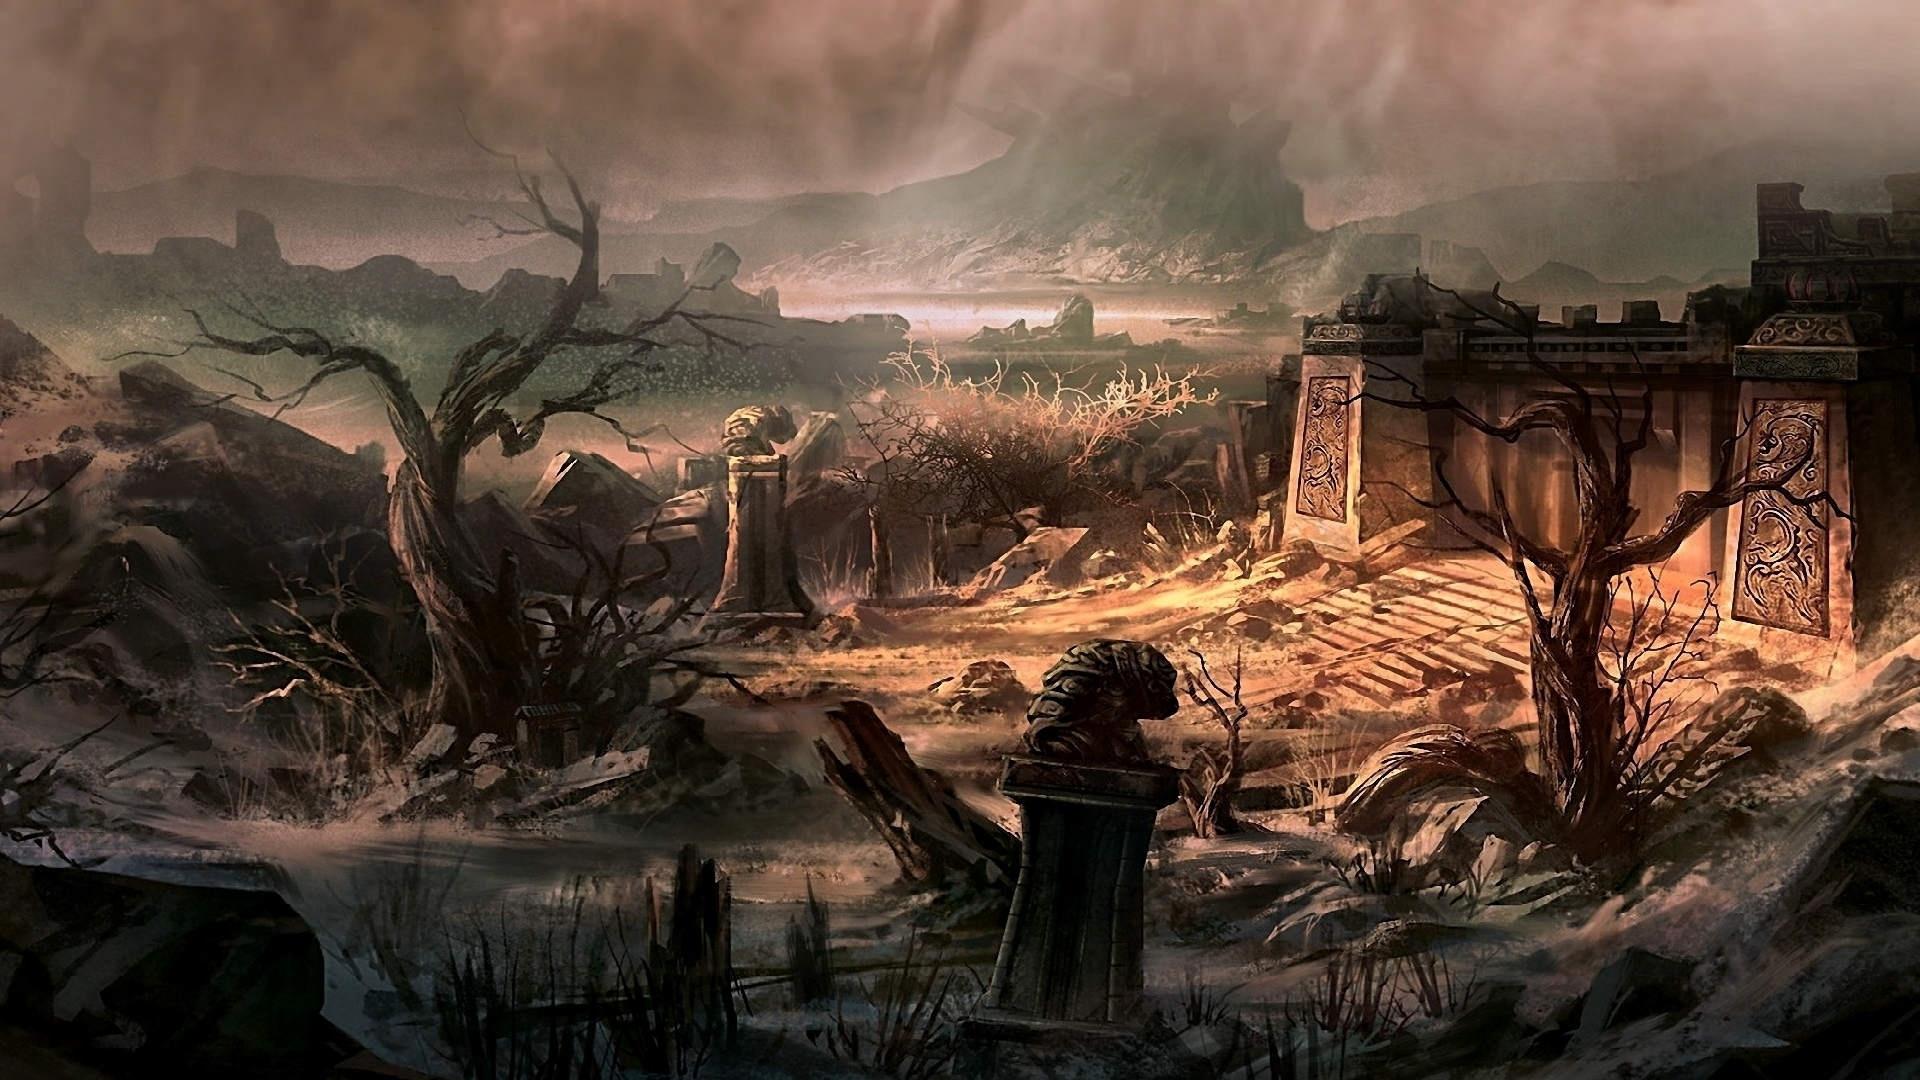 Ruins Art cool background